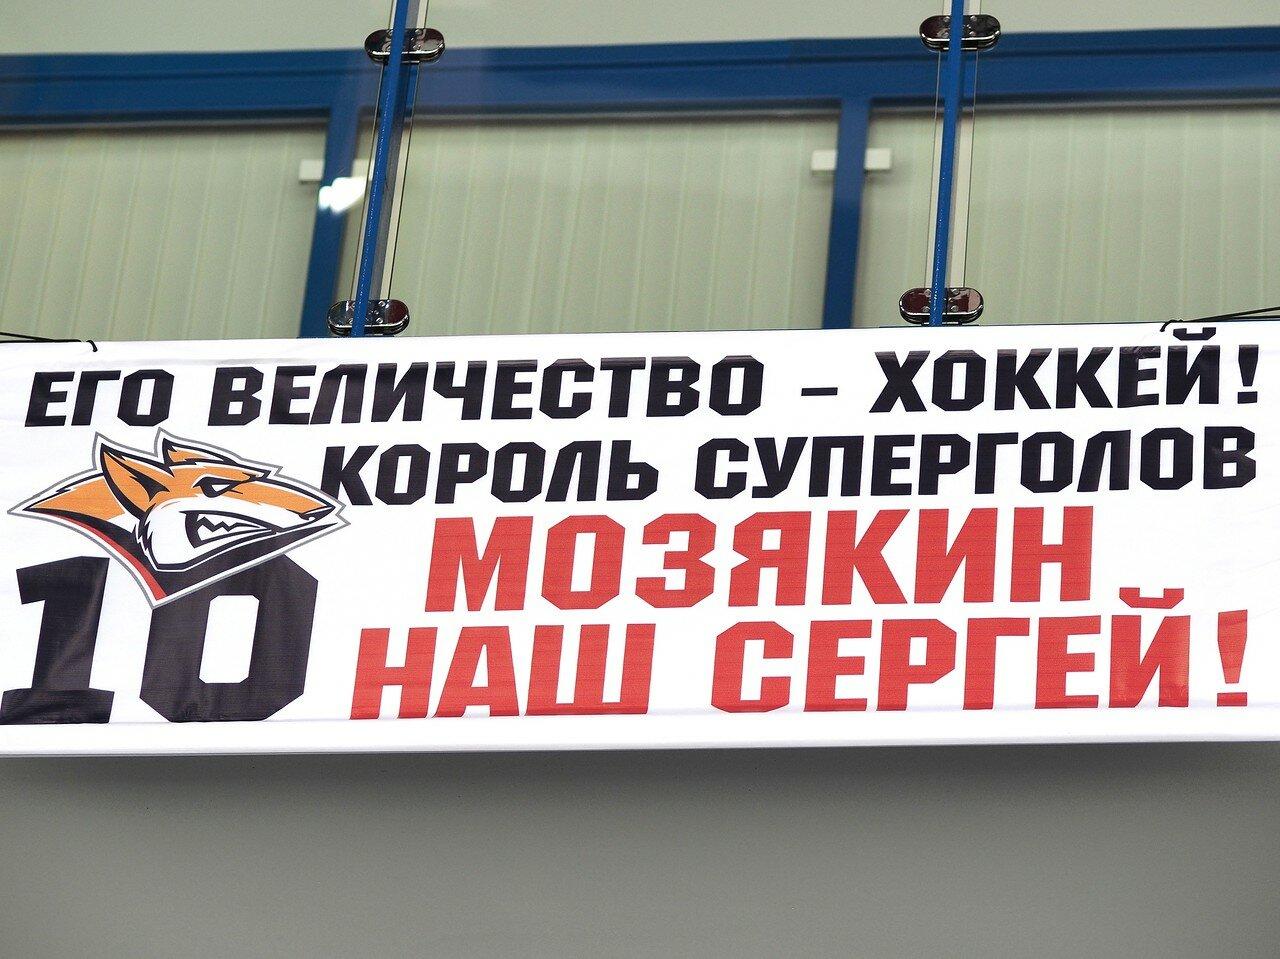 152Восток 1/2 плей-офф Металлург - Сибирь 08.03.2016